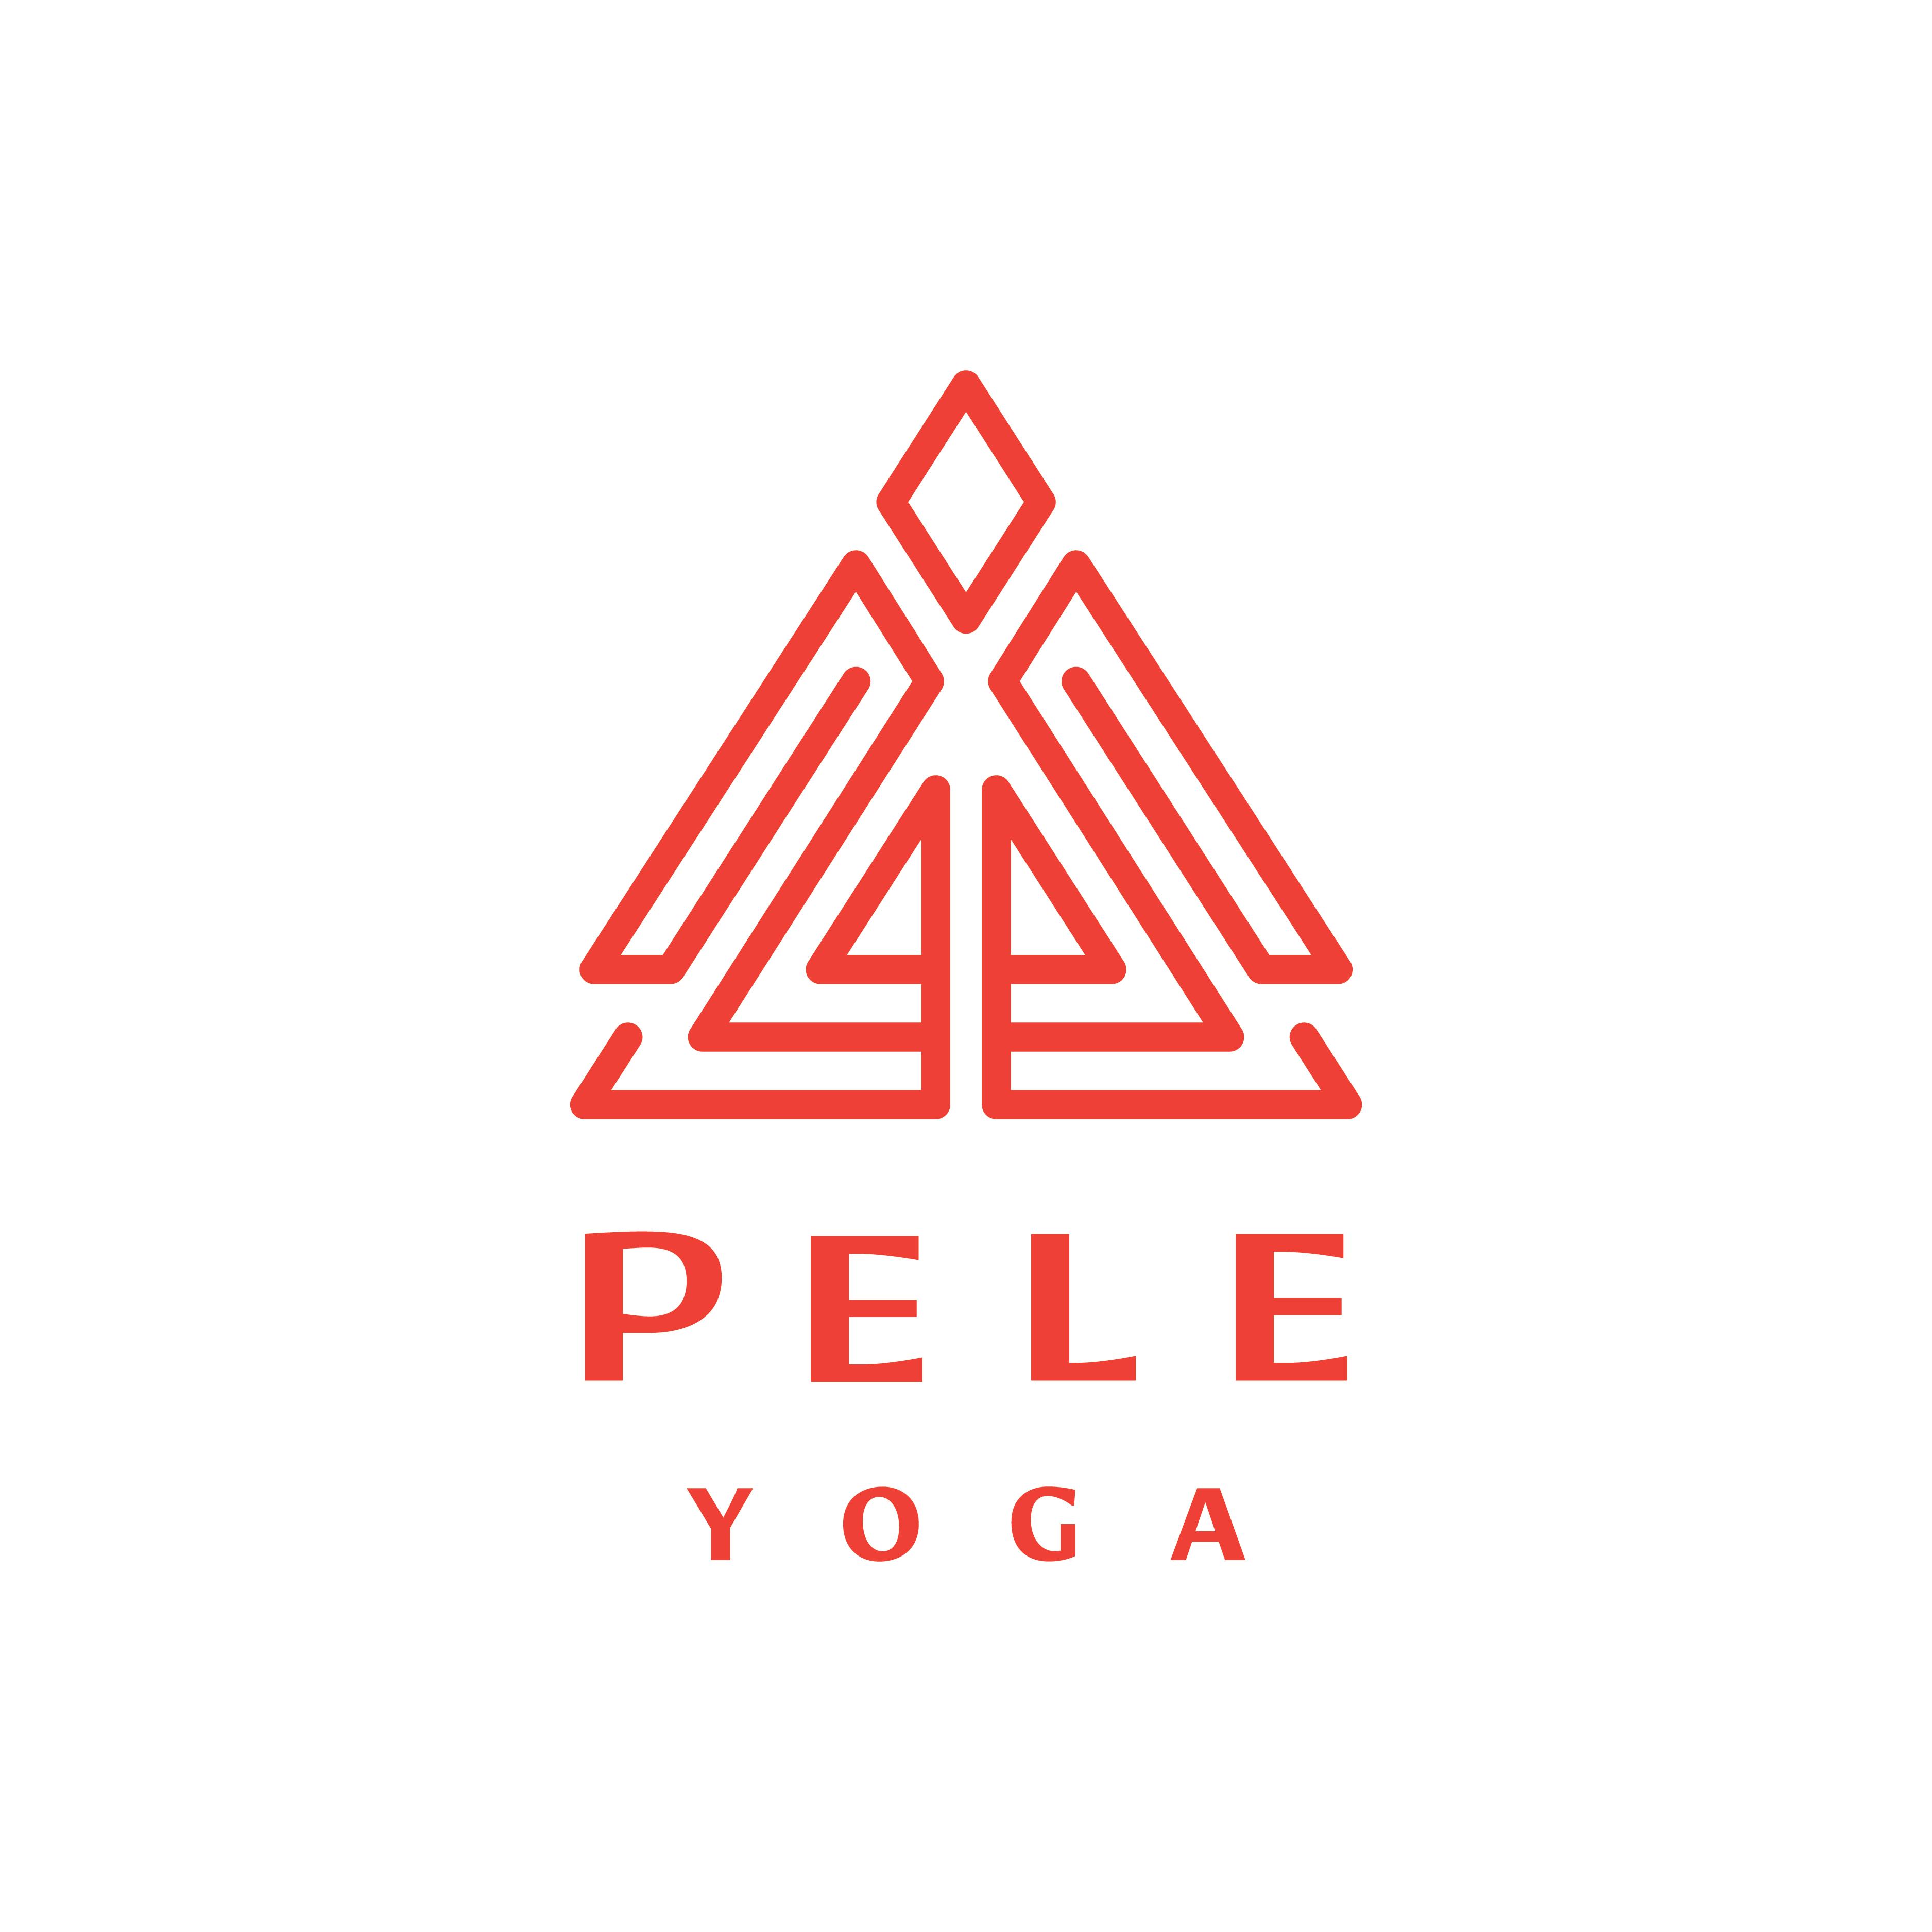 Pele Yoga